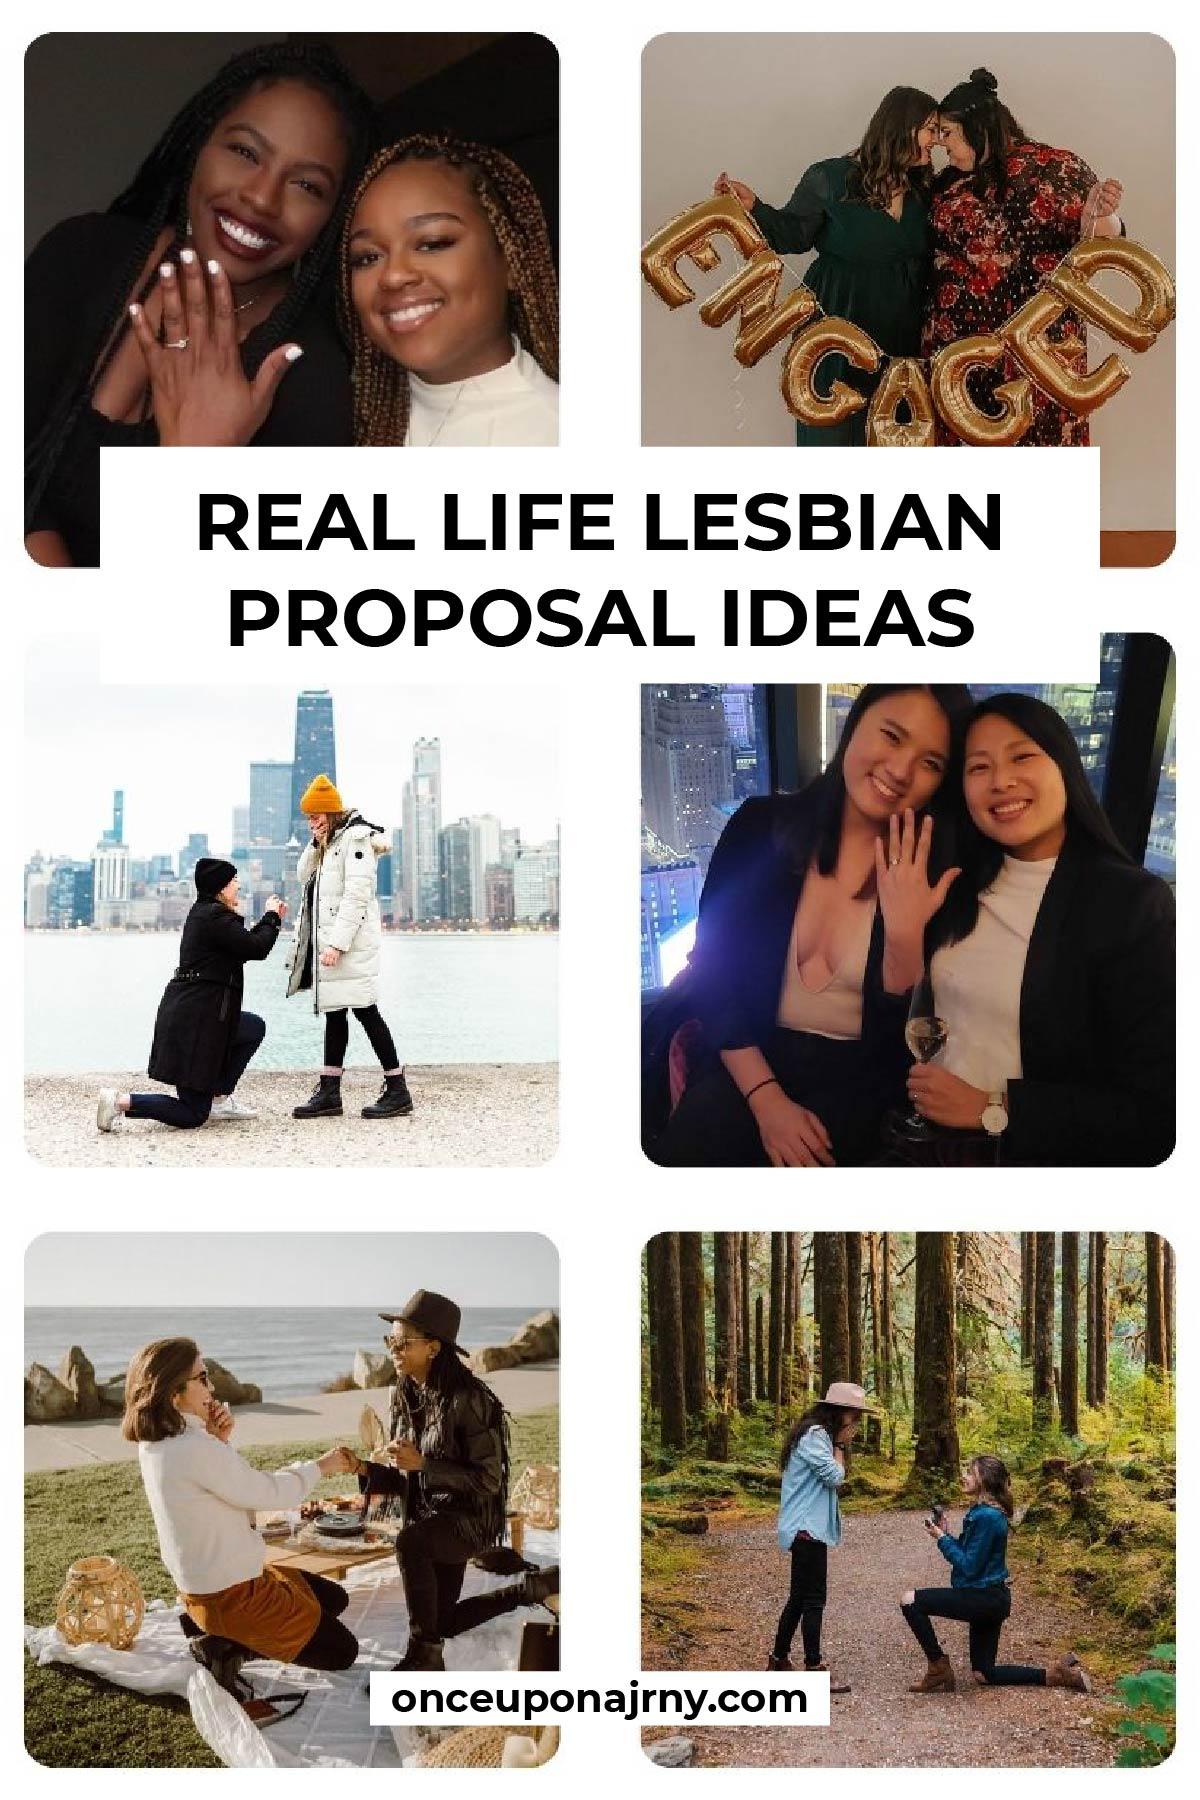 Real life lesbian proposal ideas